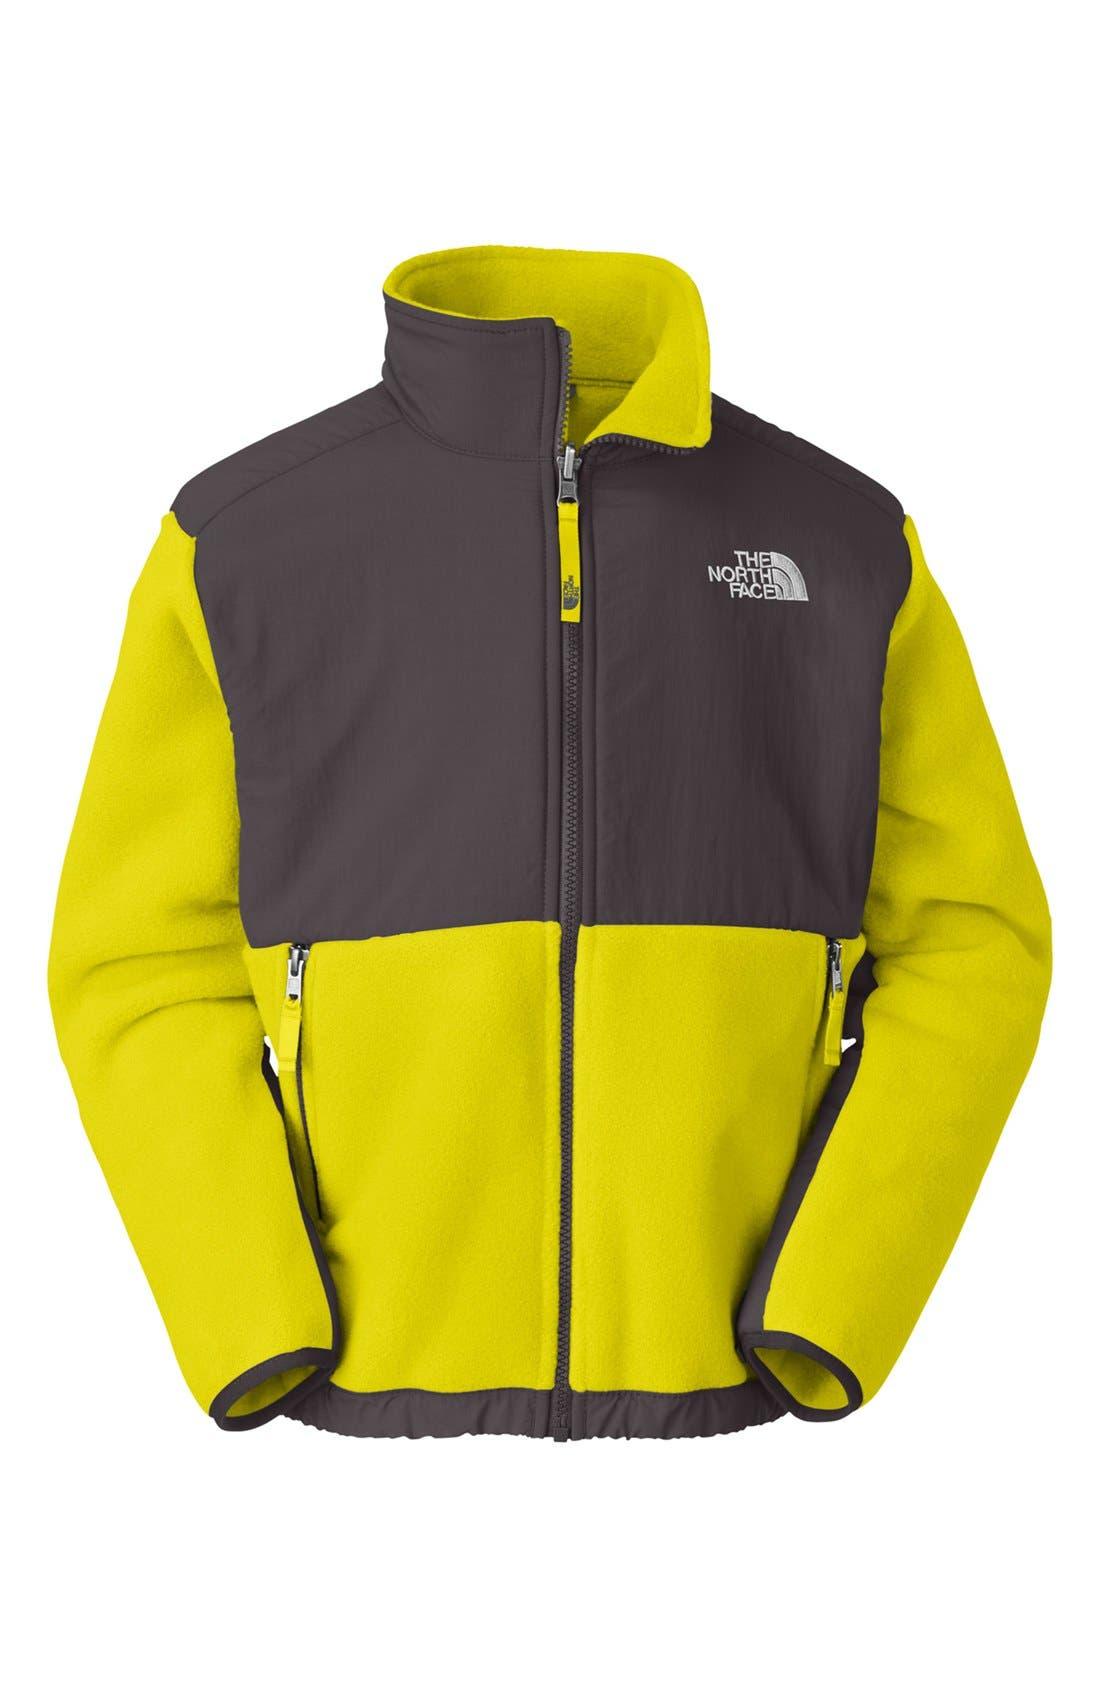 Alternate Image 1 Selected - The North Face 'Denali' Fleece Jacket (Little Boys)